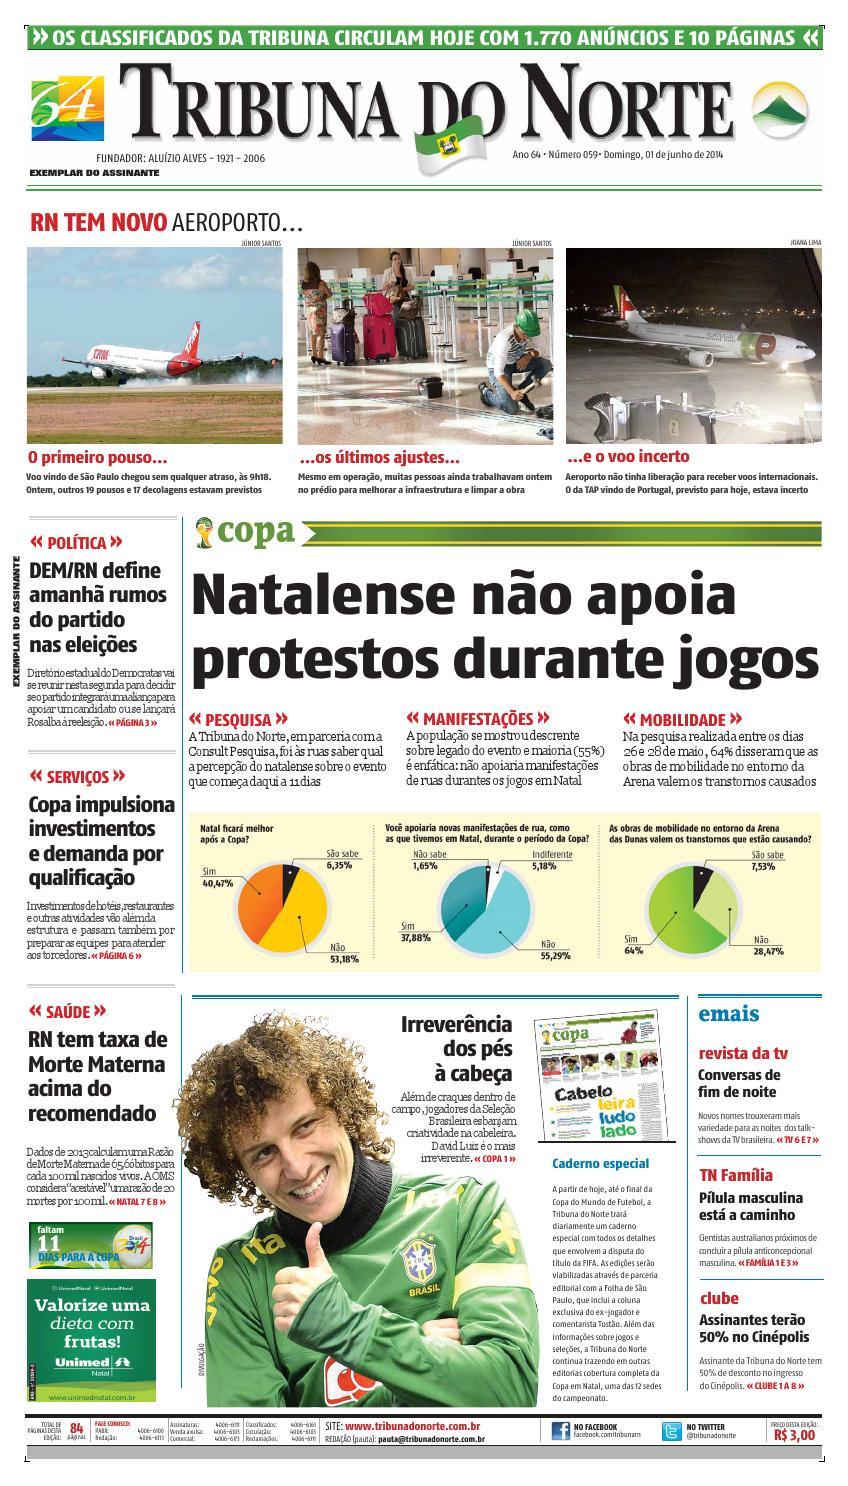 Tribuna do Norte - 01 06 2014 by Empresa Jornalística Tribuna do Norte Ltda  - issuu ccf5febc2d